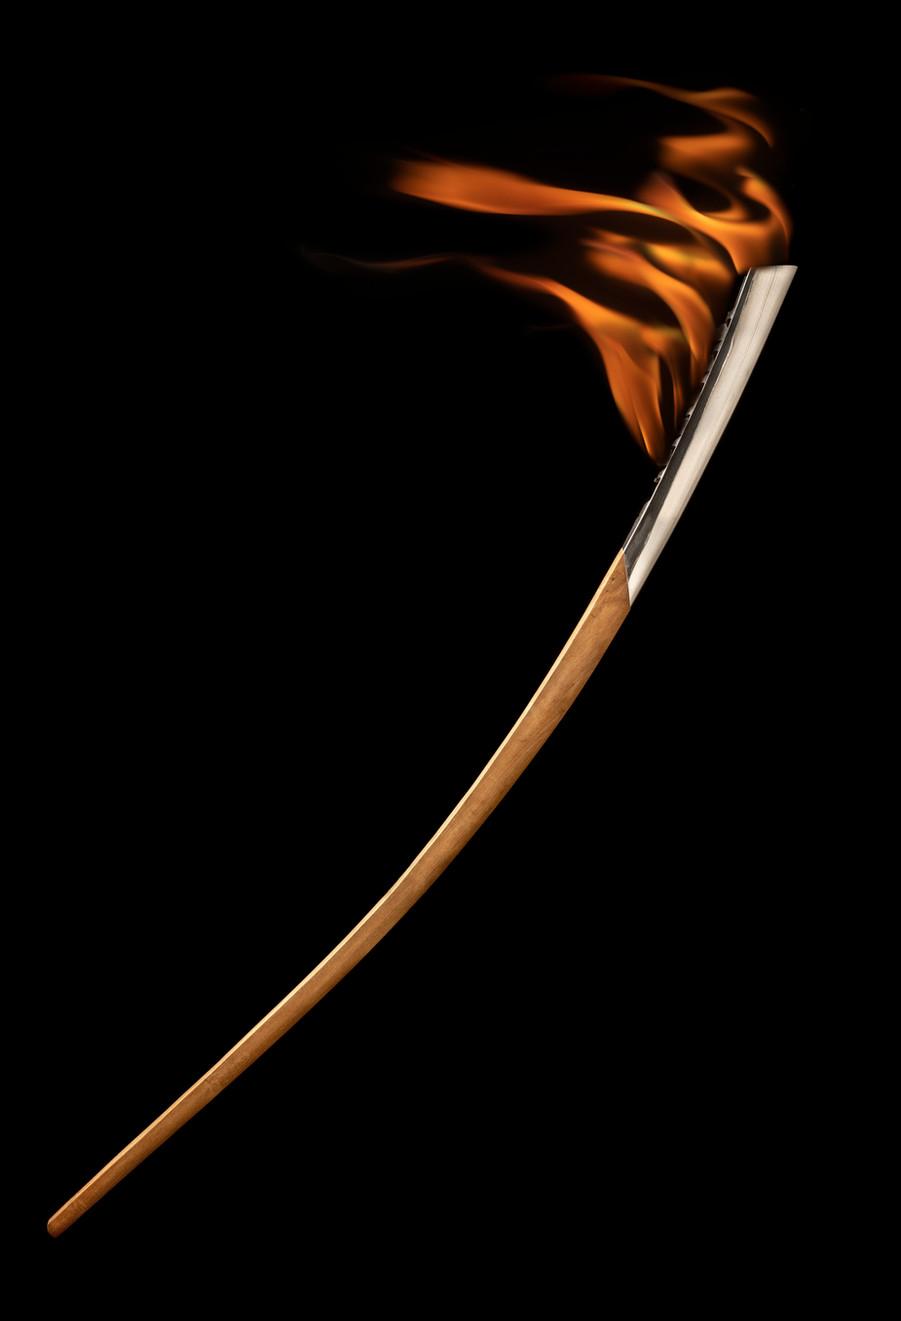 Olympic torch FLAME Black-01 - FM.jpg